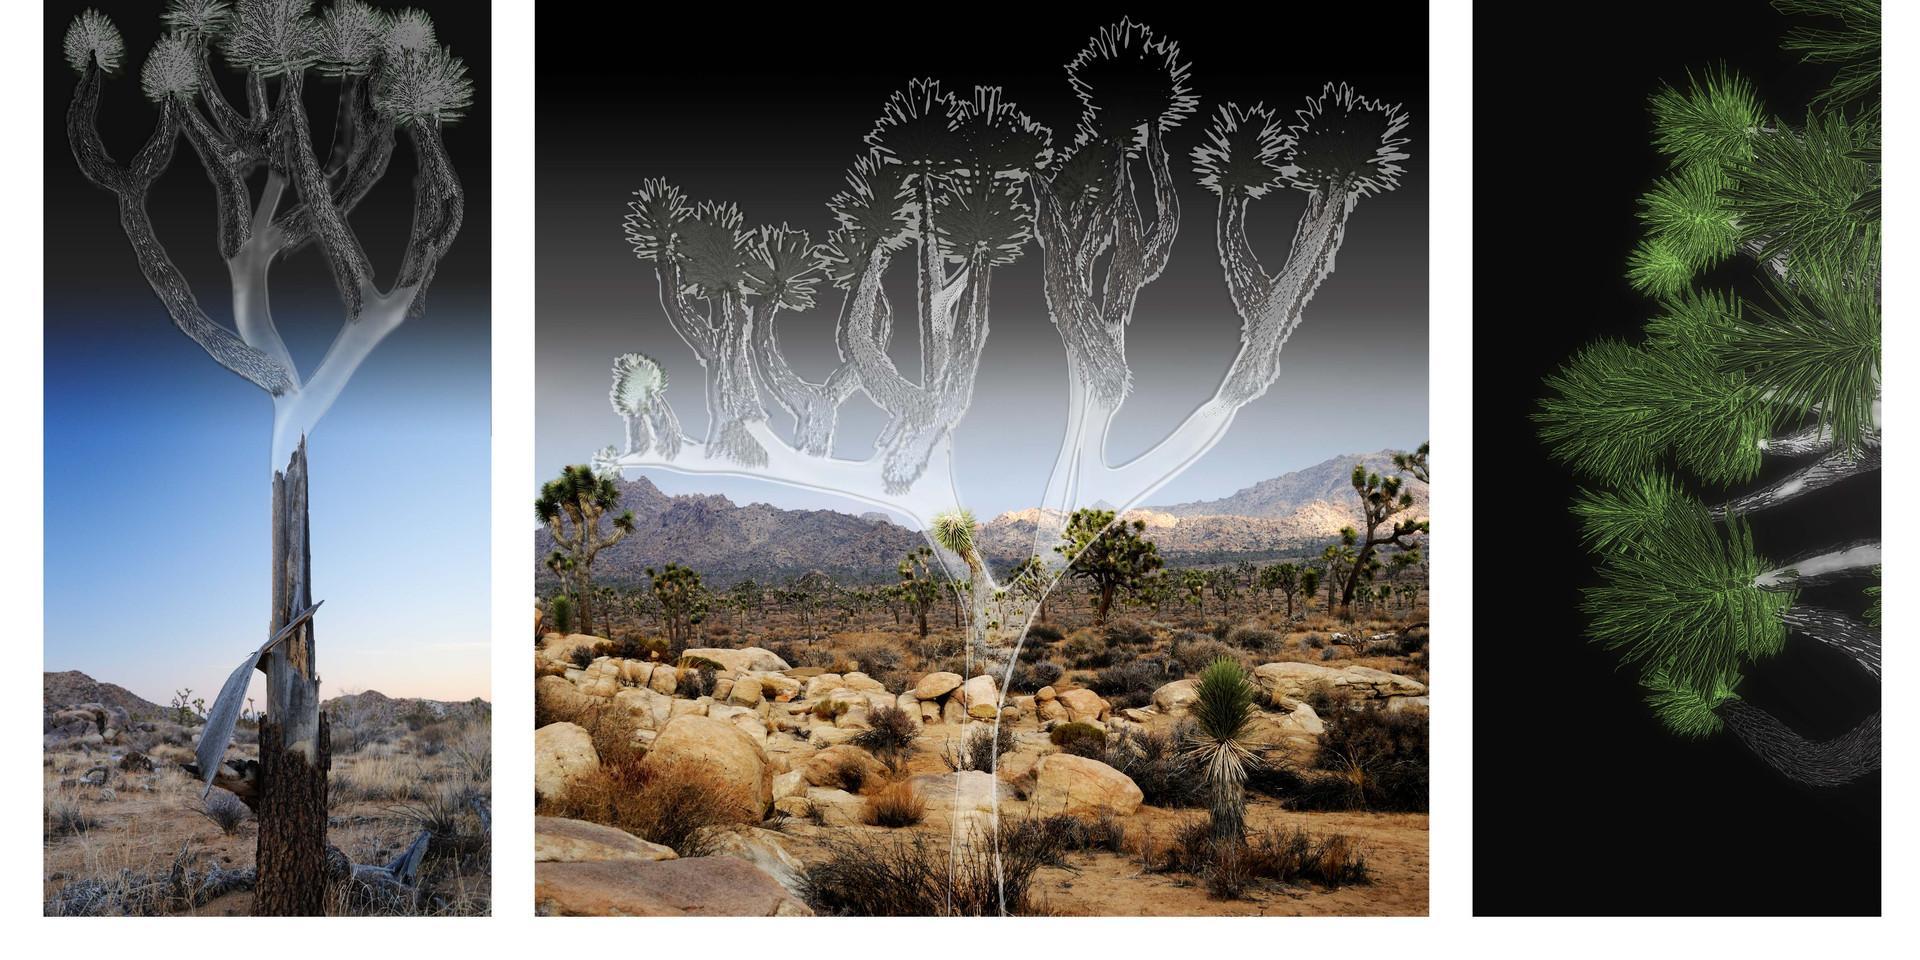 Joshua tree ghosts